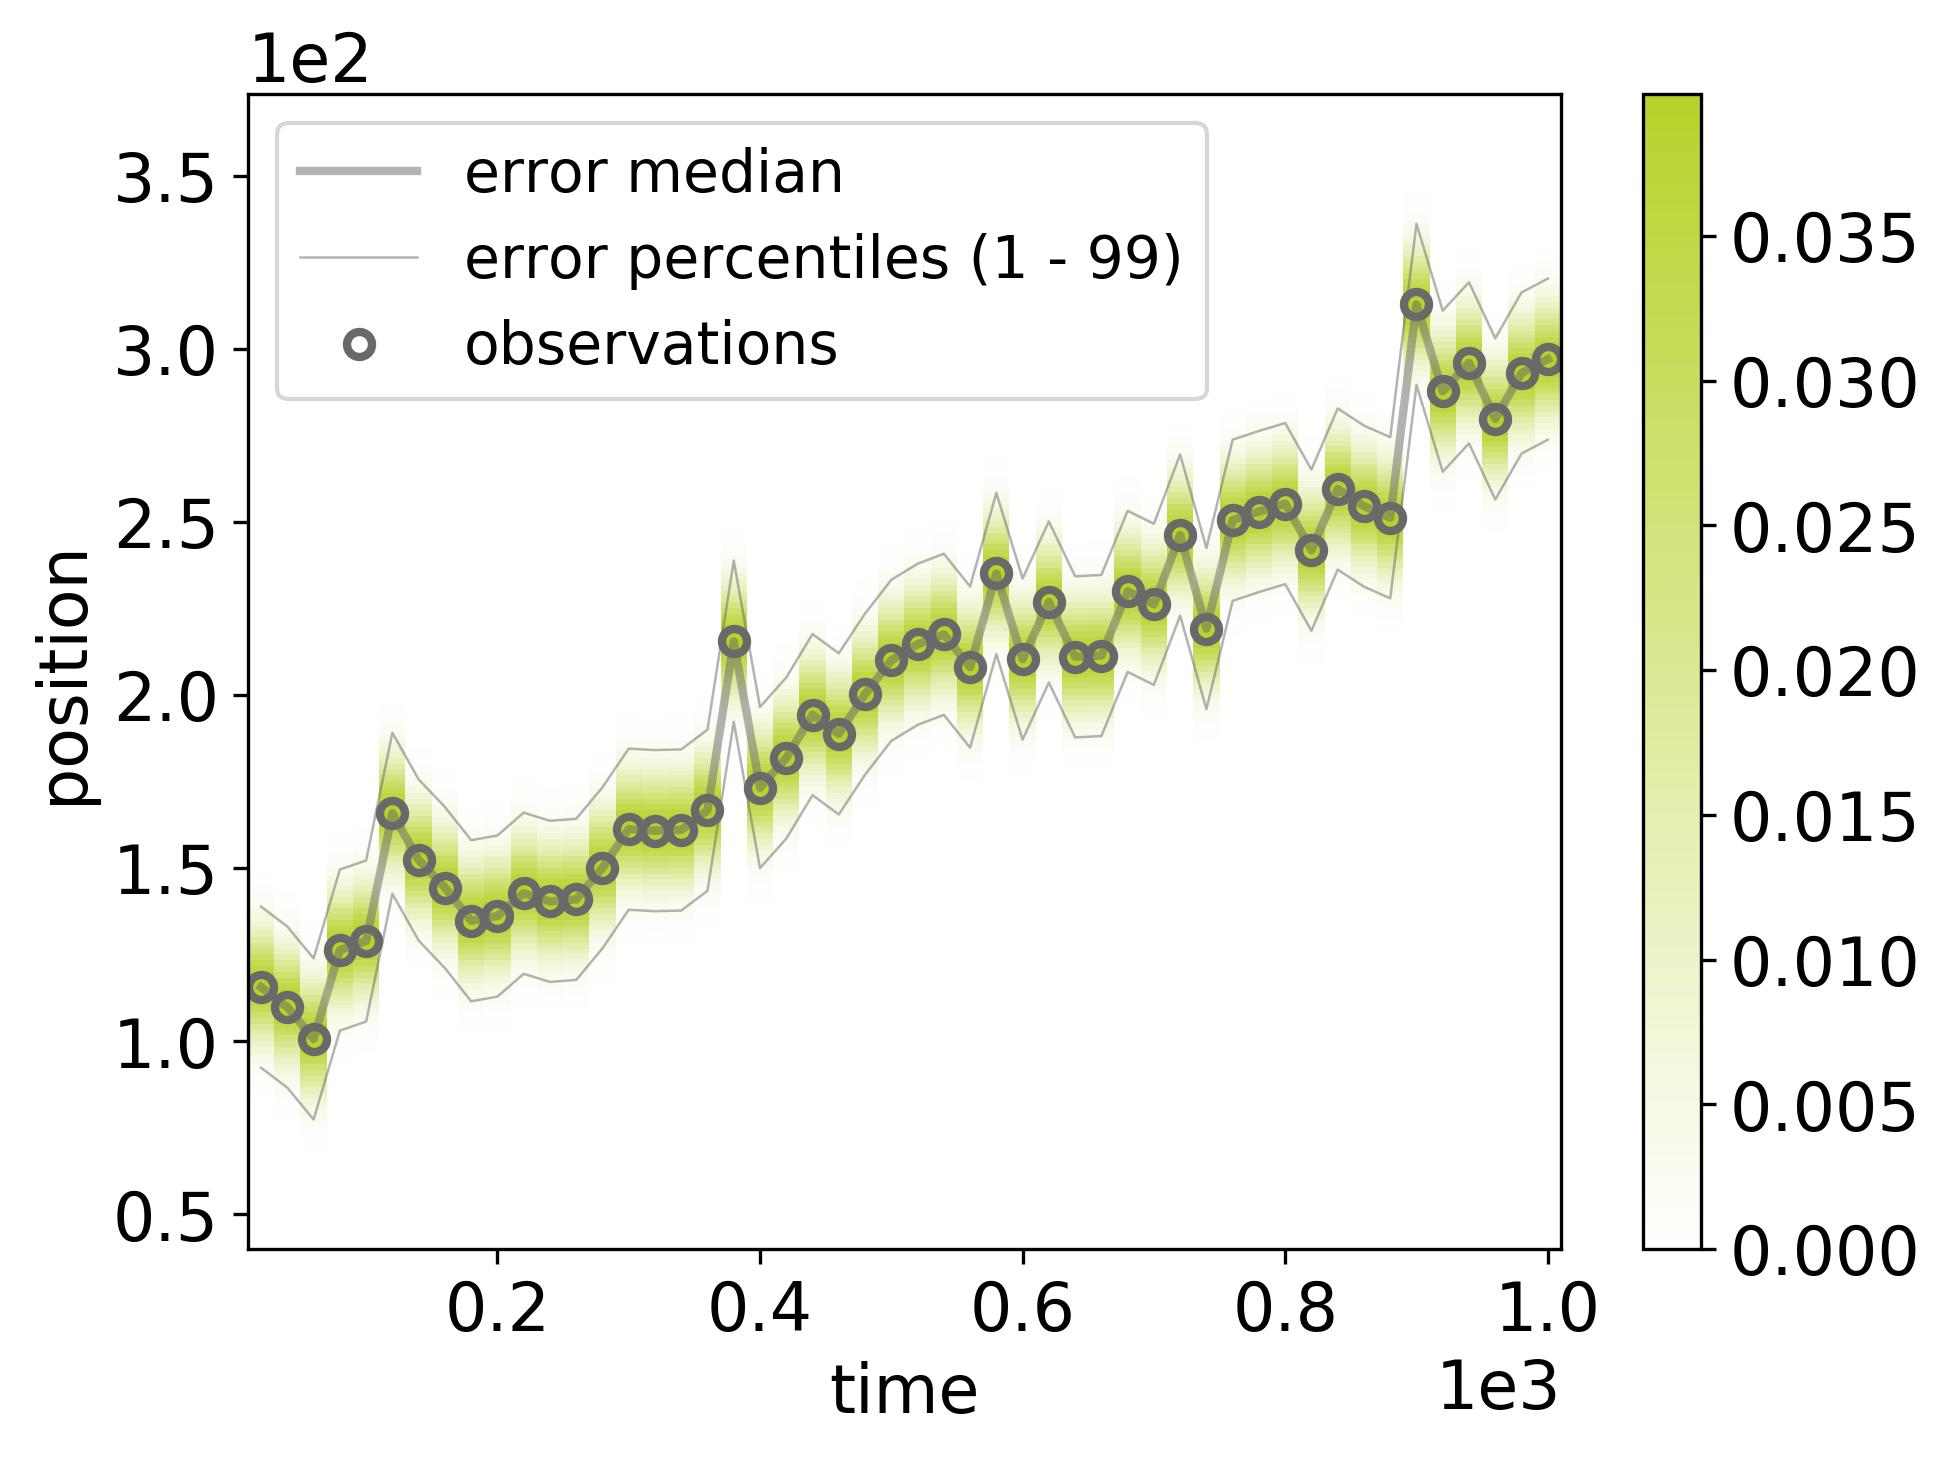 docs/_static/randomwalk/randomwalk_errors-dataset-2.png